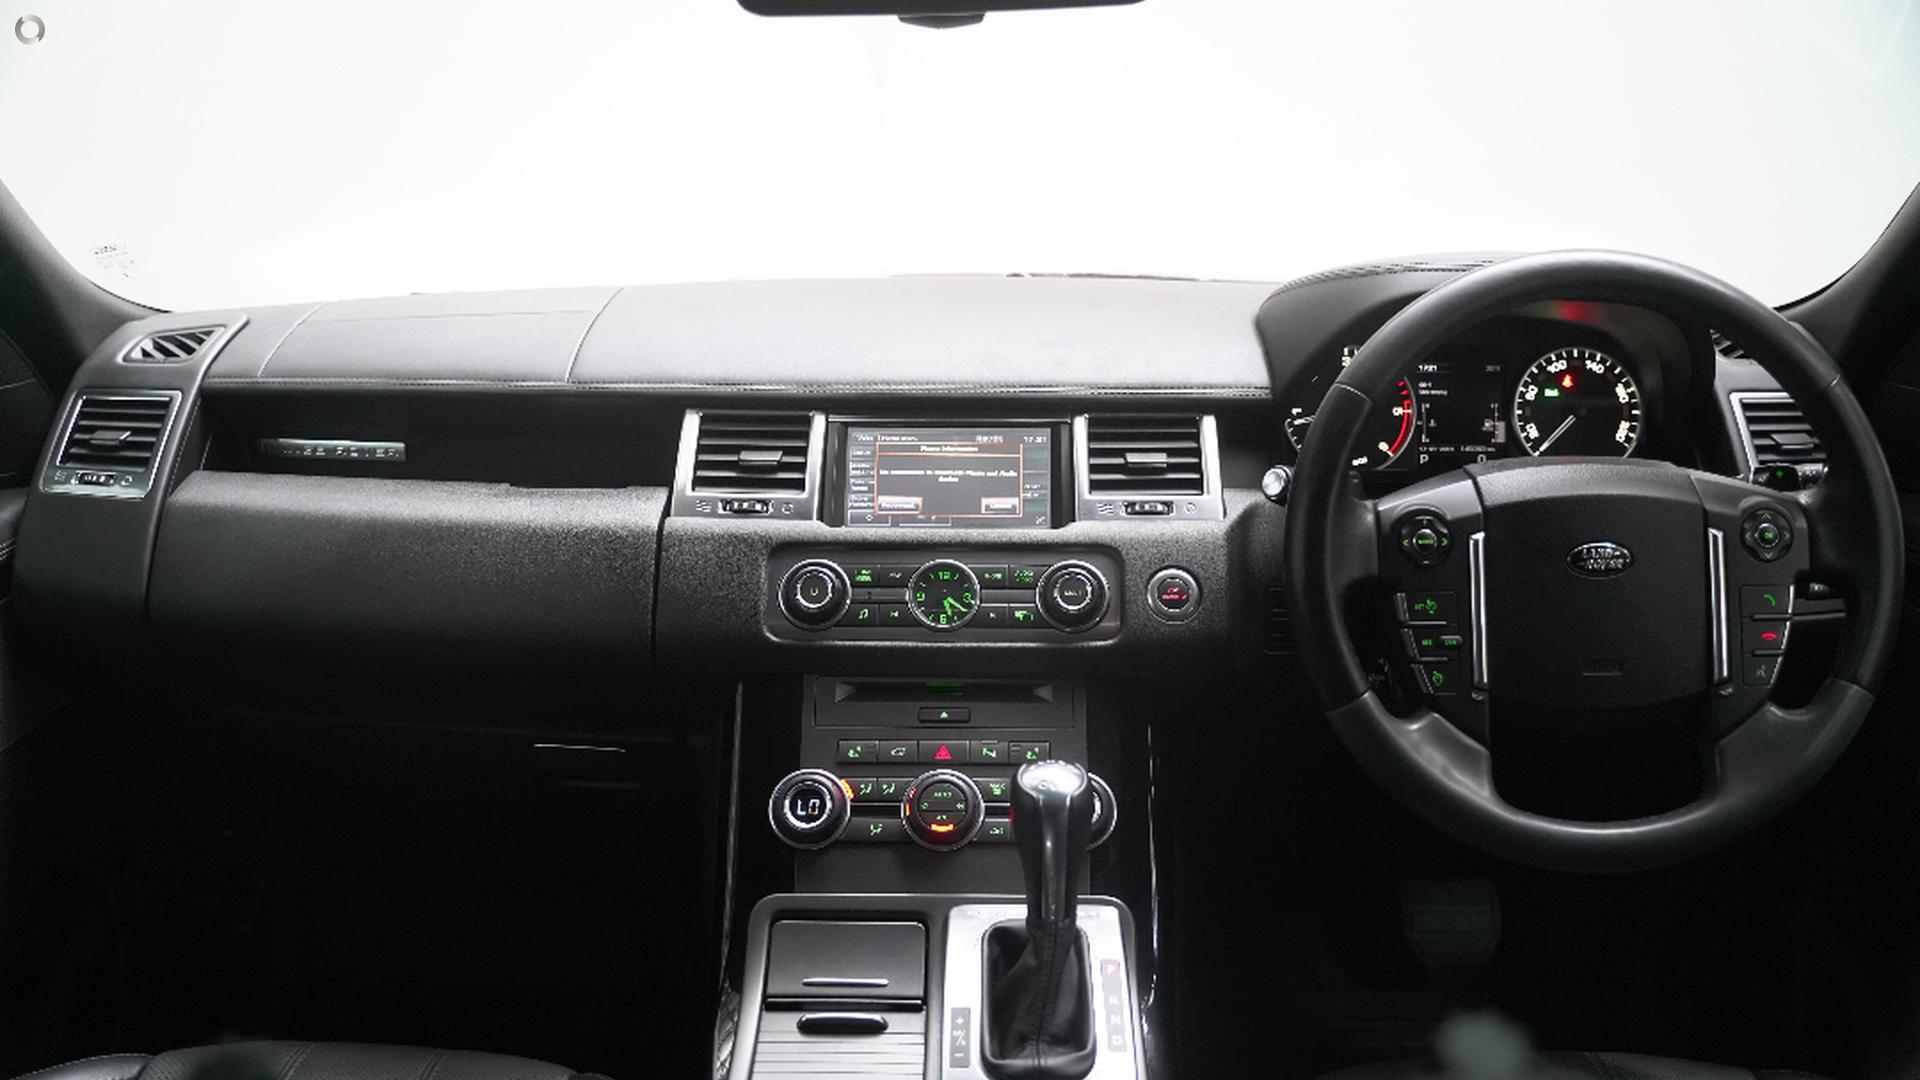 2013 Land Rover Range Rover Sport SDV6 Autobiography L320